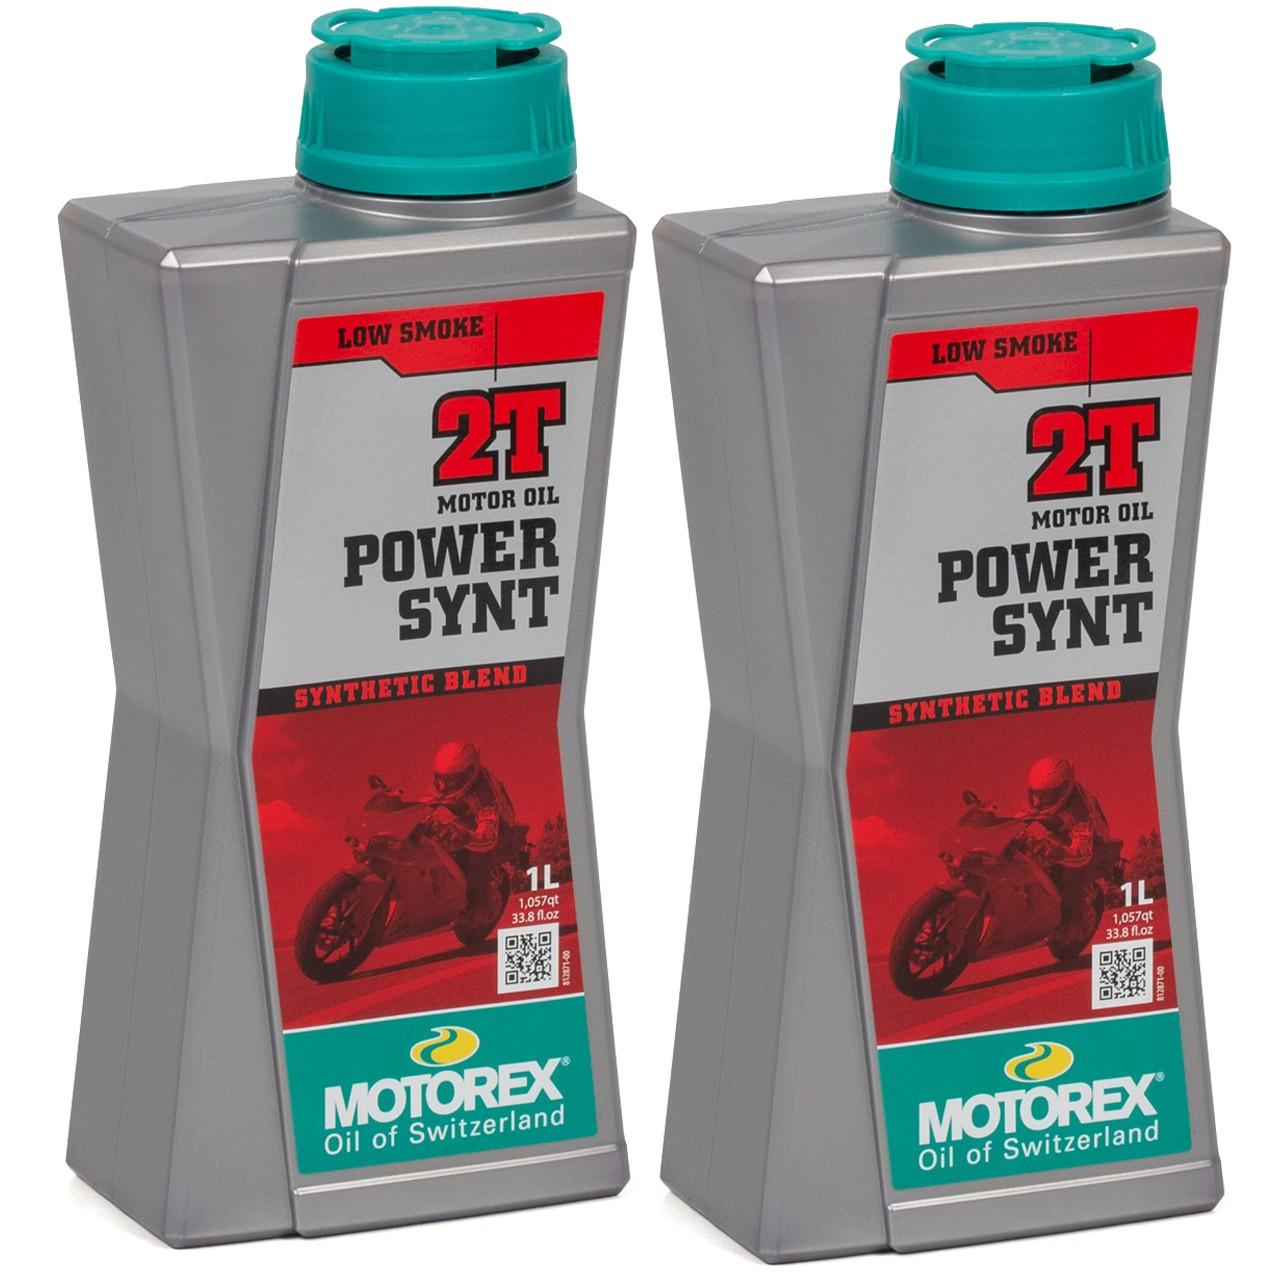 MOTOREX Power Synt 2T LOW SMOKE Motoröl API TC JASO FD ISO-L-EGD - 2L 2 Liter